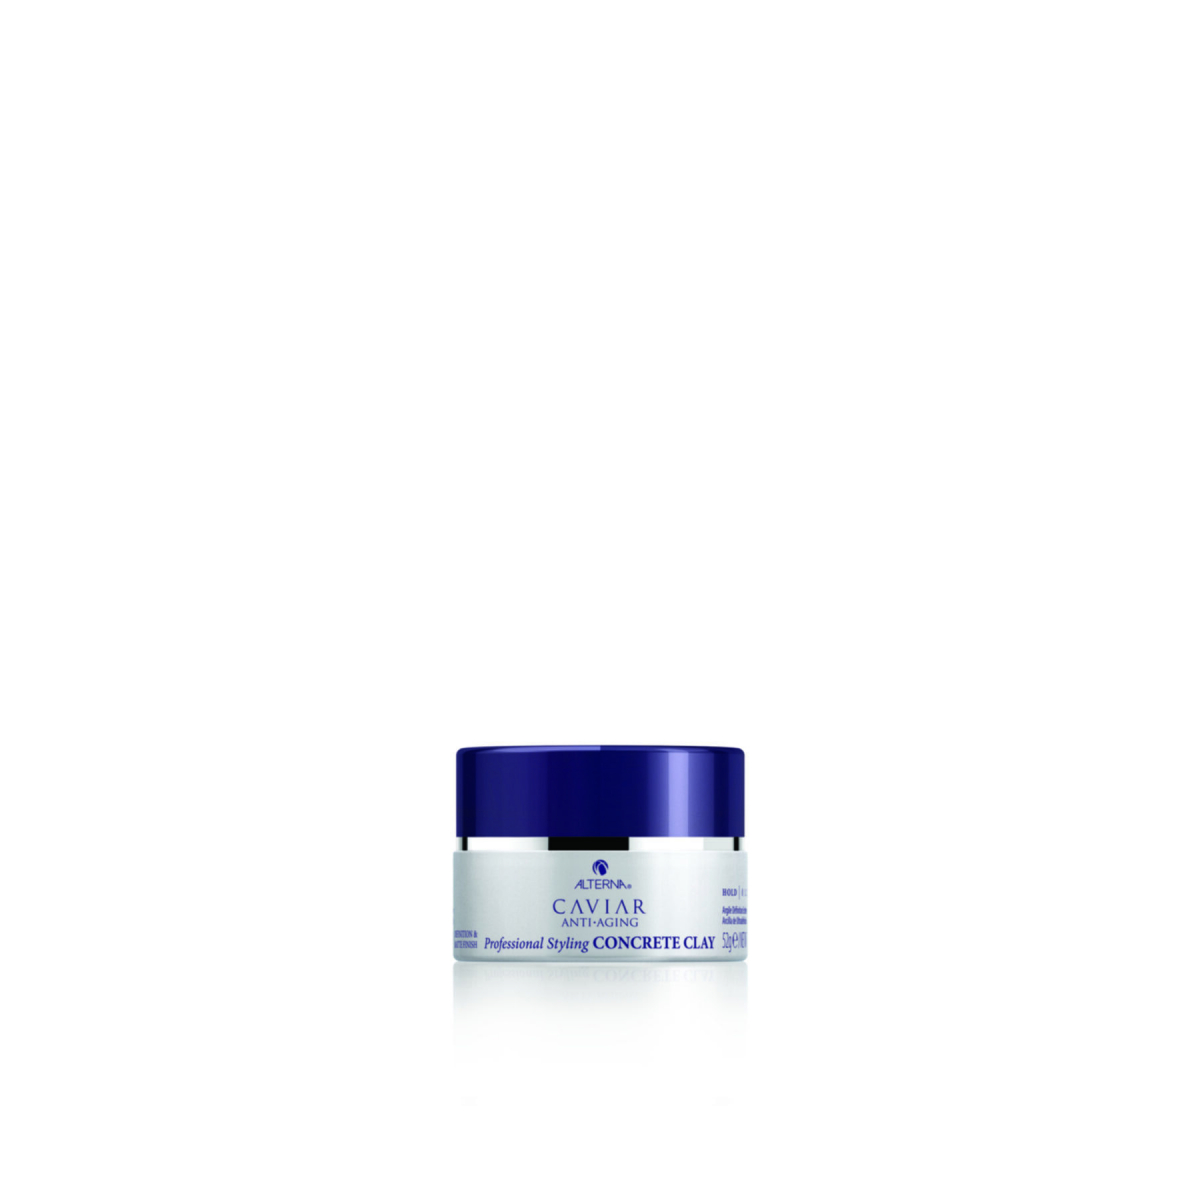 ALTERNA Caviar Profesyonel Saç Şekillendirici Kil 50g